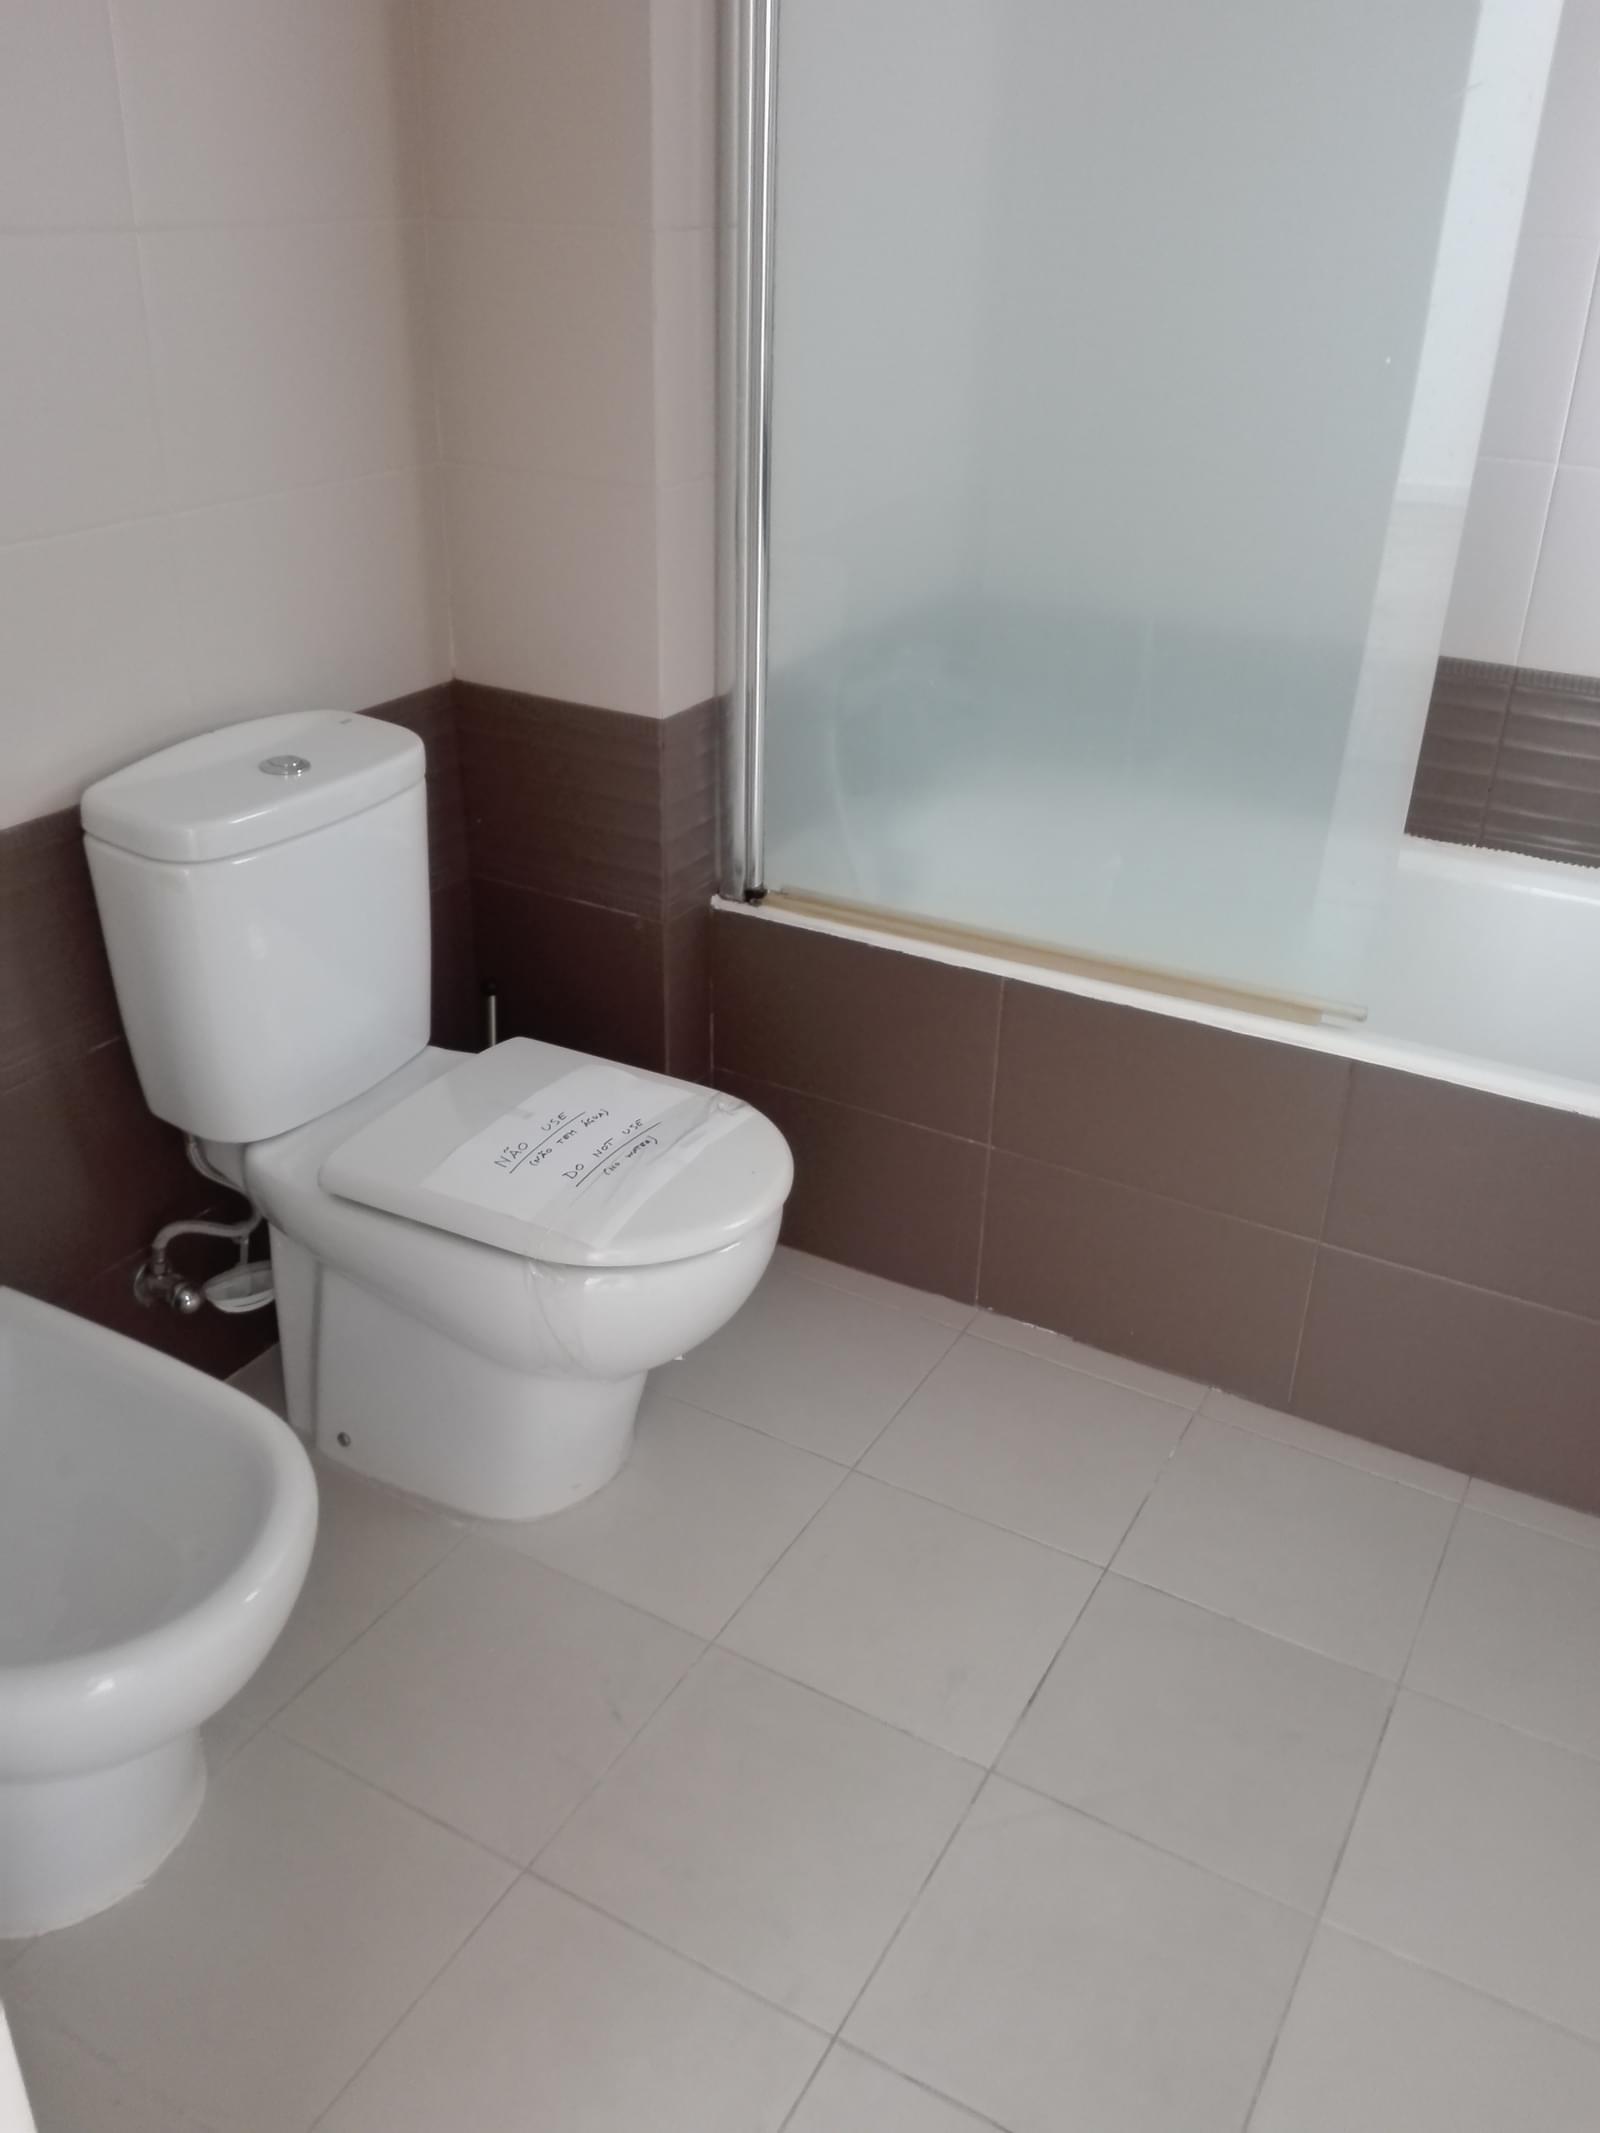 pf17908-apartamento-t1-lisboa-99ea8f53-4cbe-42cb-9f2c-72dc3dd7d702